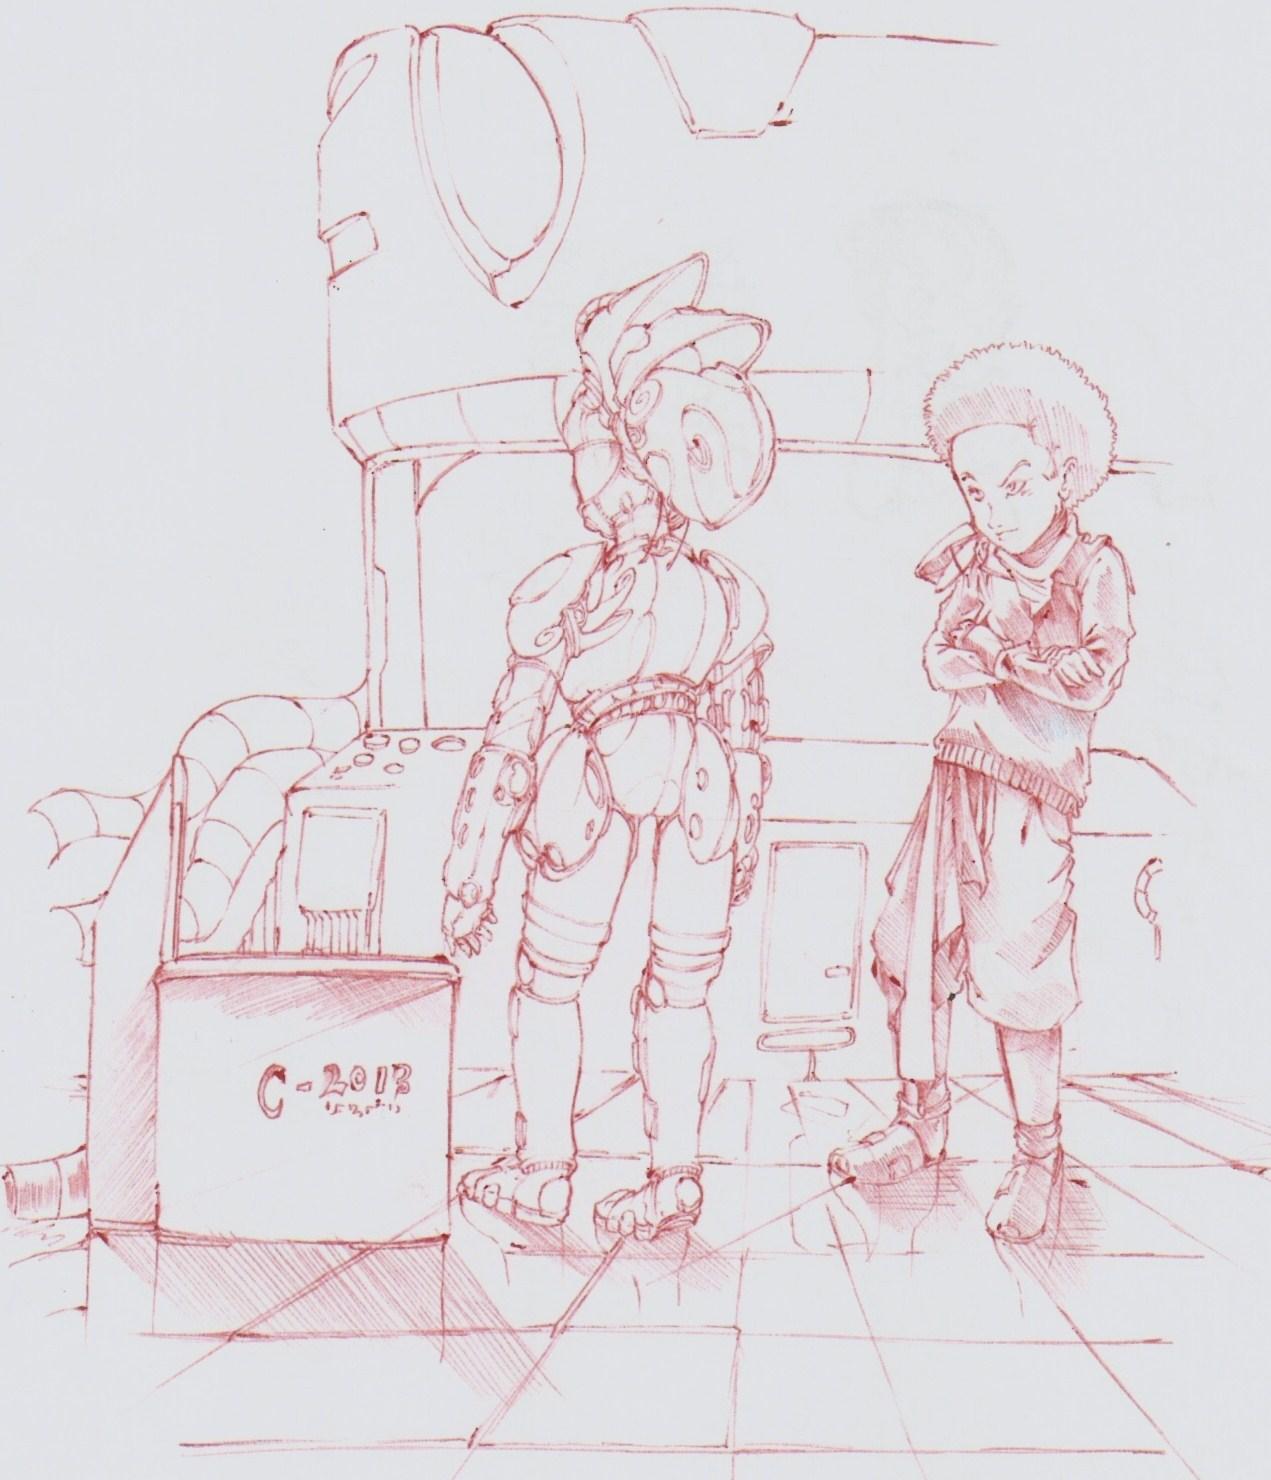 Boy and his machine